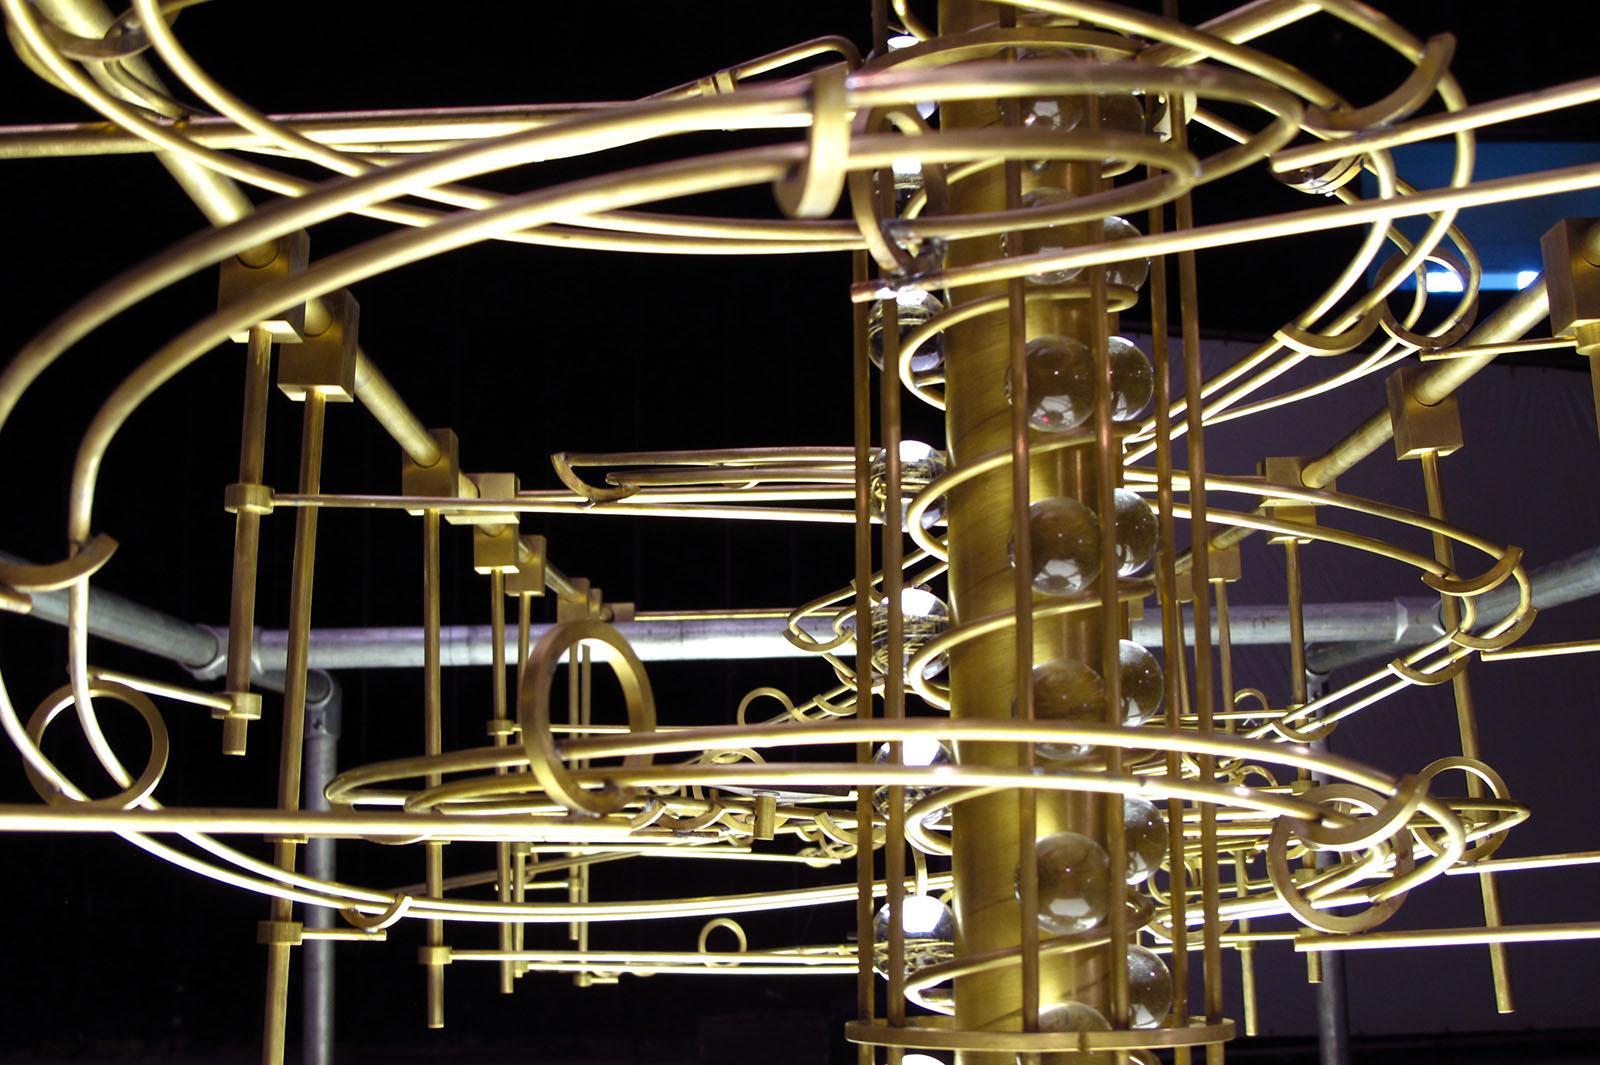 'Rube Goldburg' machine detail - for Maybank, Malaysia